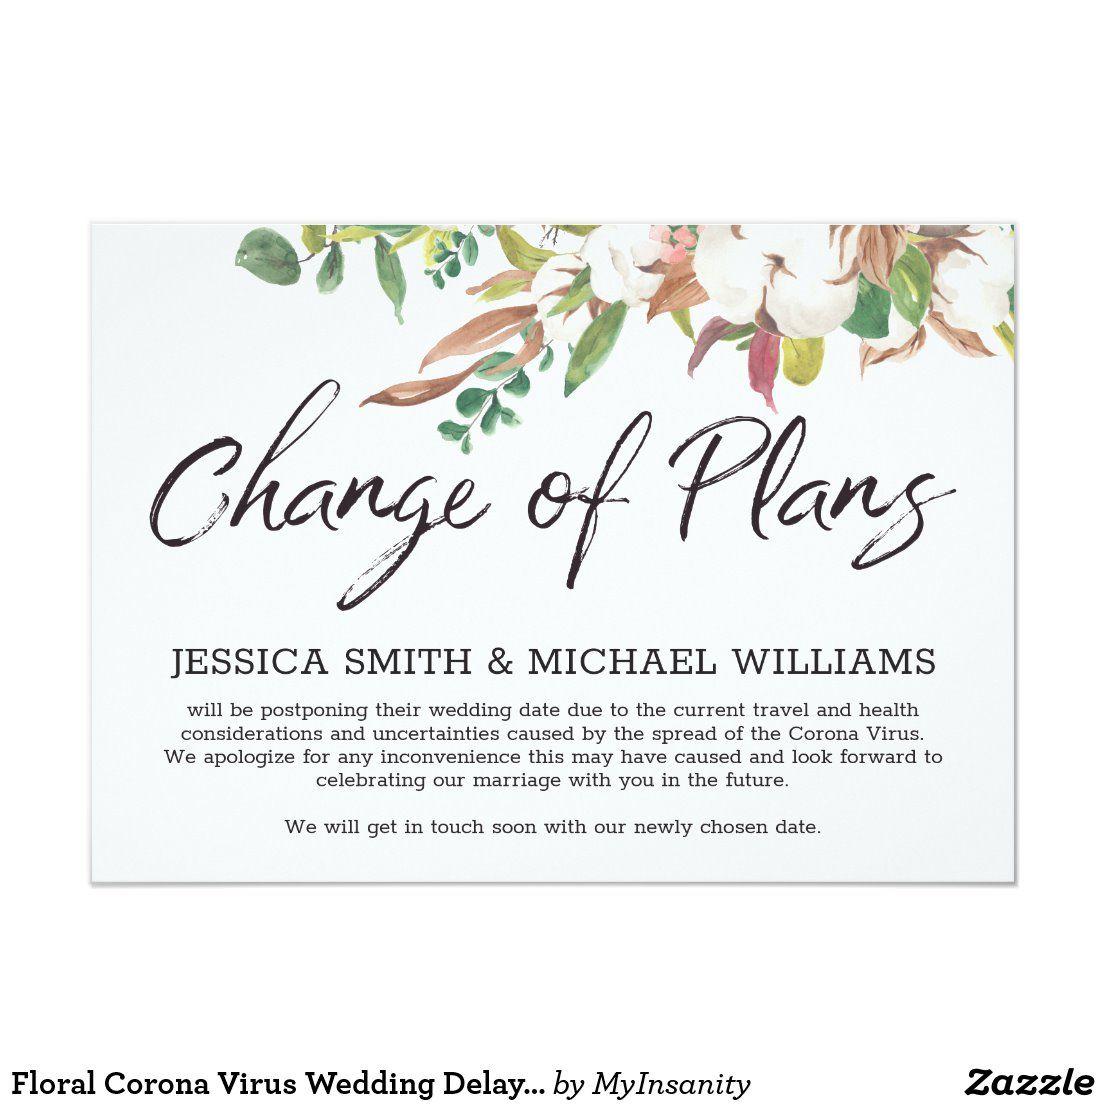 Pin on Weddings Postponed & Change of Plans